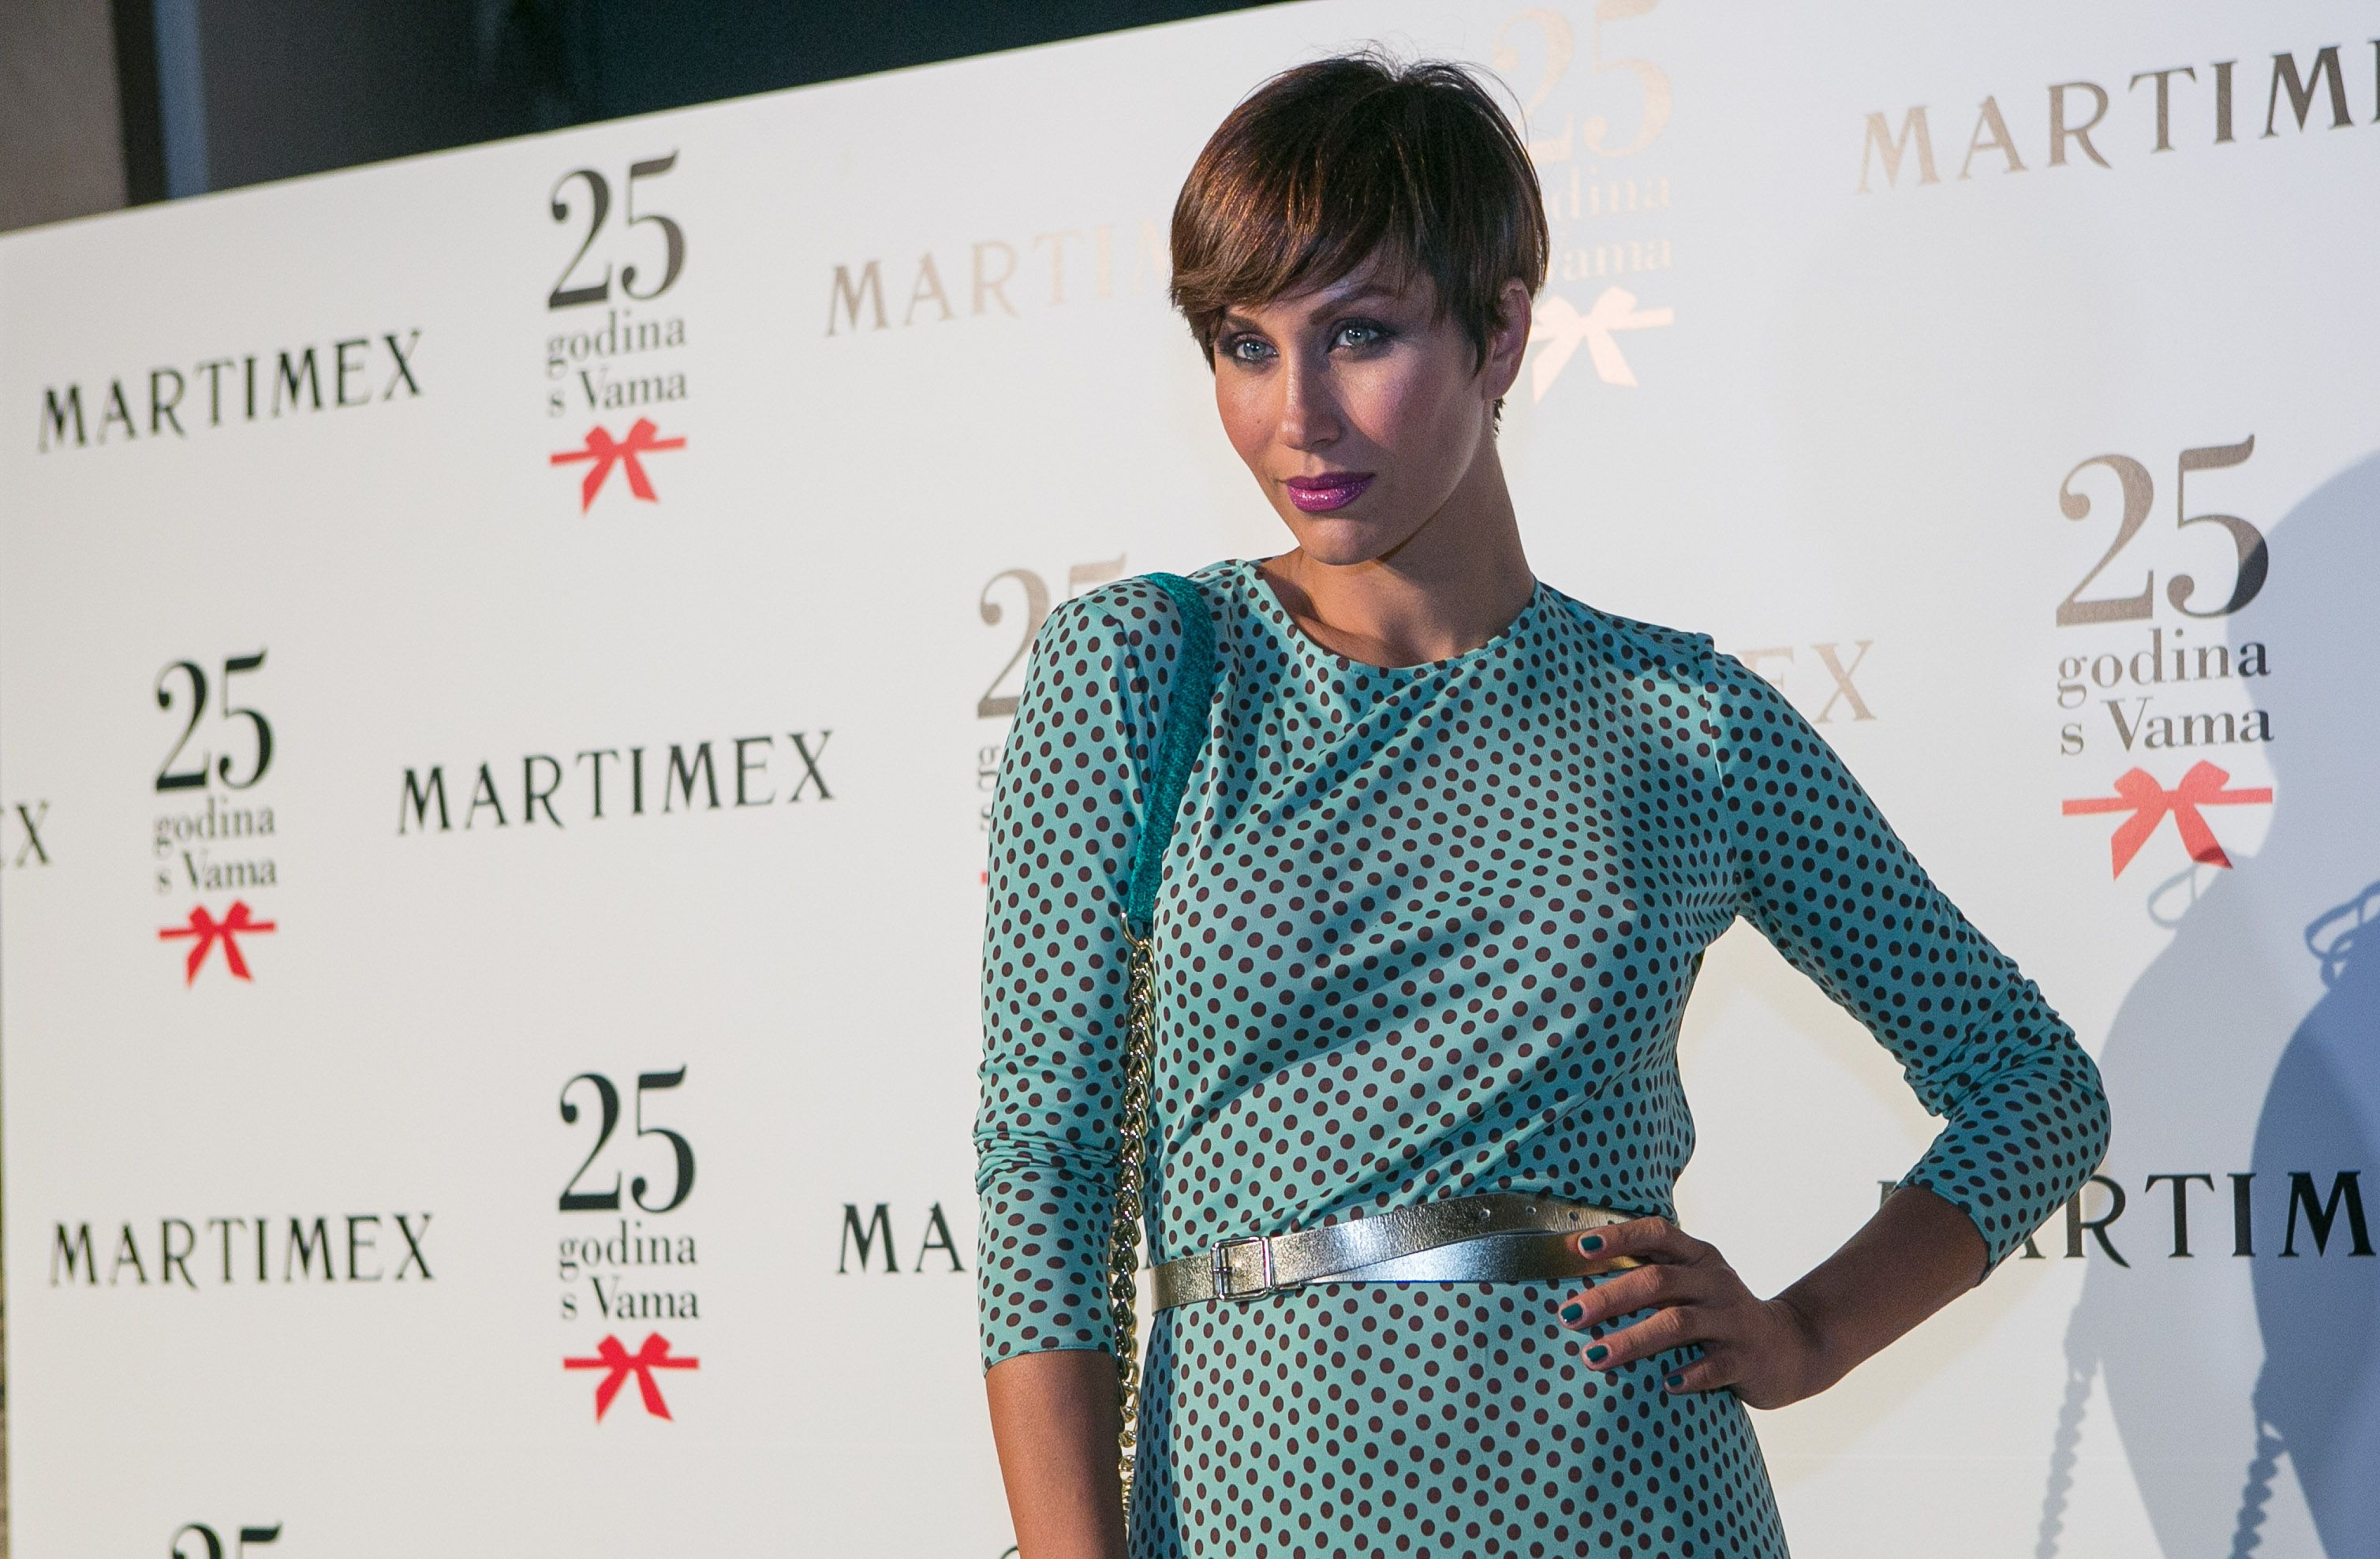 Brojne hrvatske dame okupile se na rođendanu Martimexa